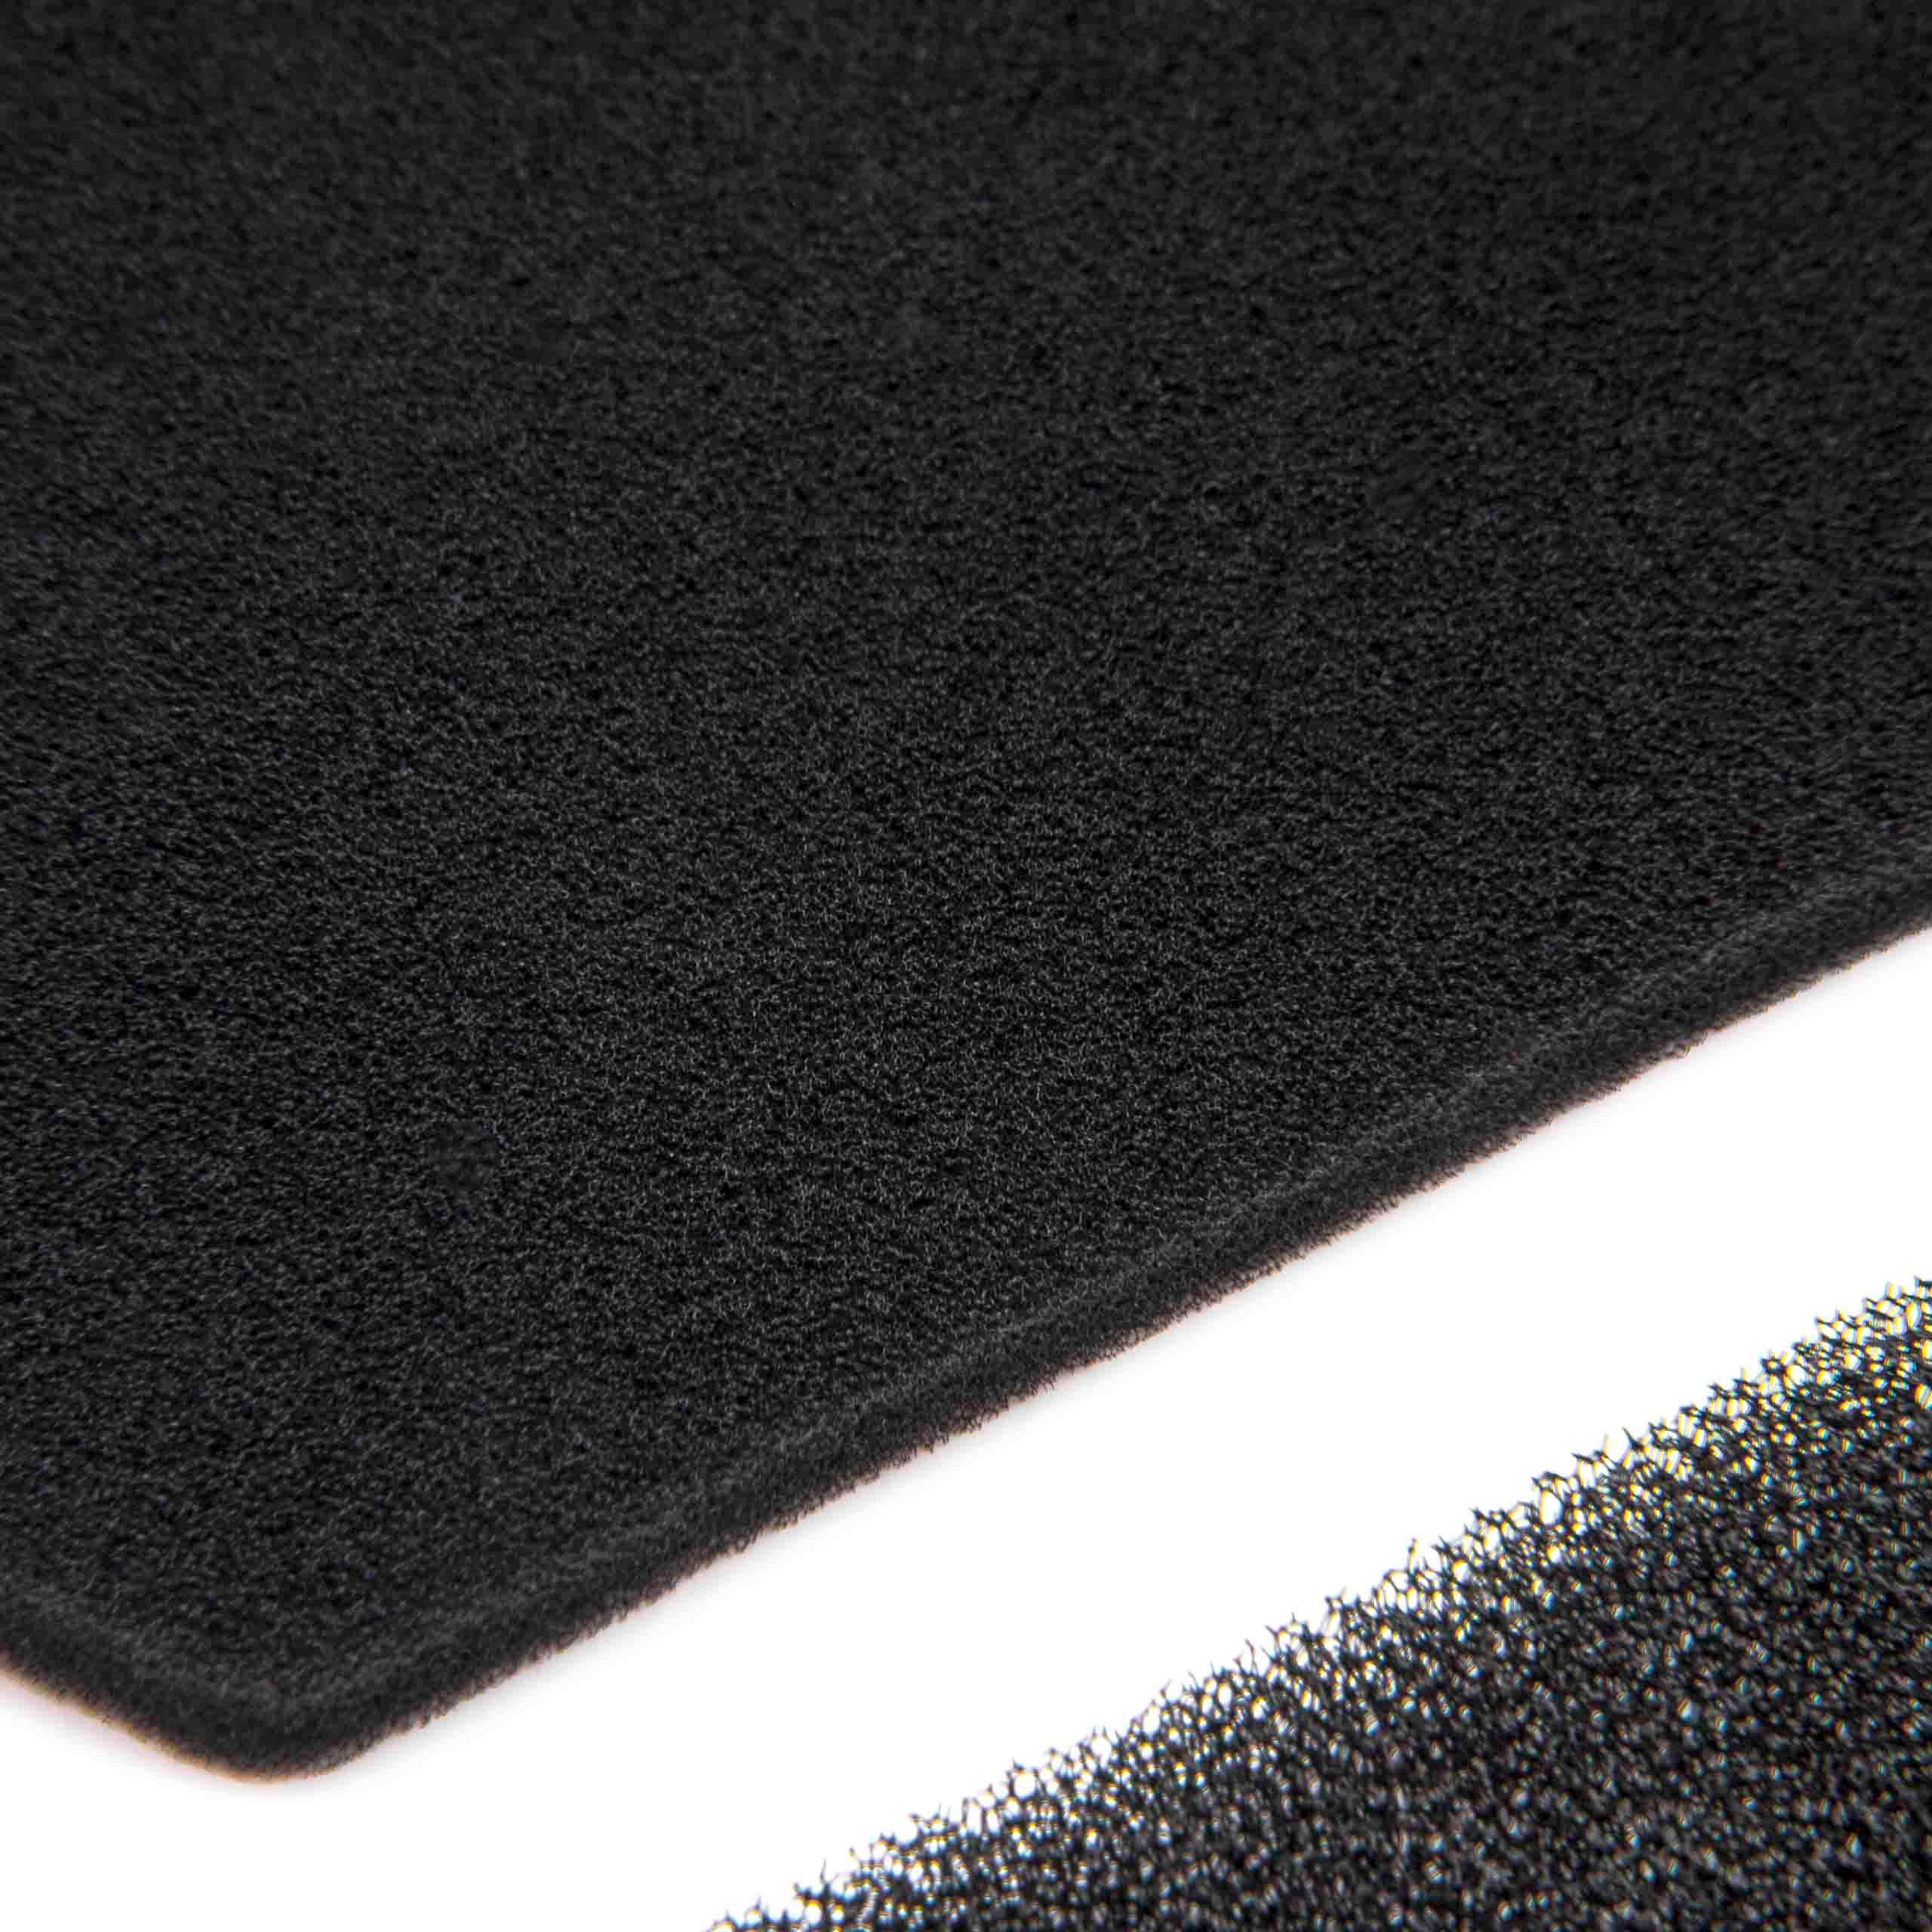 schaumfilter schwammfilter 2 1 f r miele set teilenummer. Black Bedroom Furniture Sets. Home Design Ideas